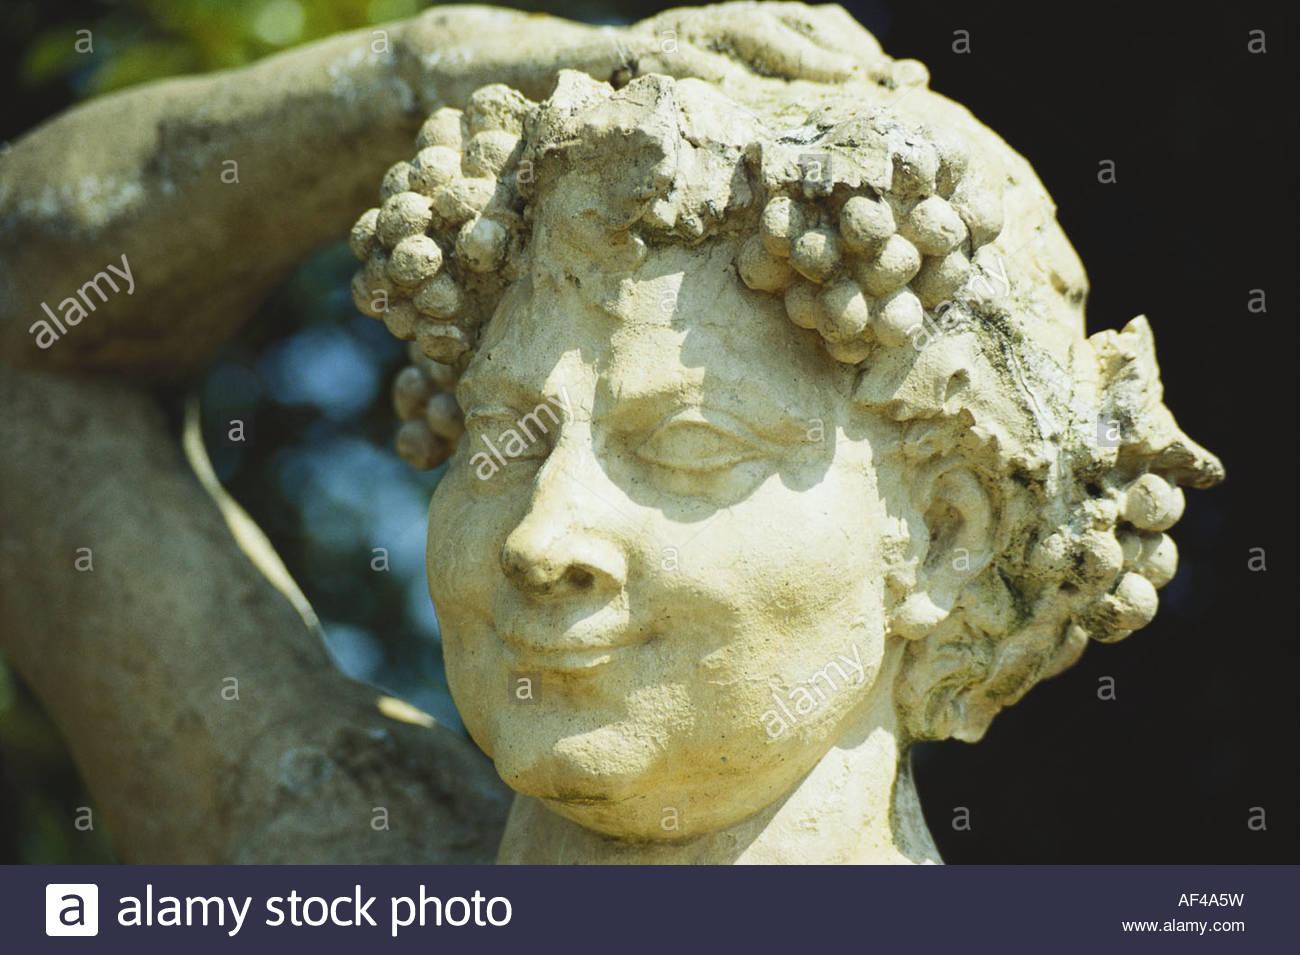 Bacchus (Roman) god of wine, stone figure - Stock Image